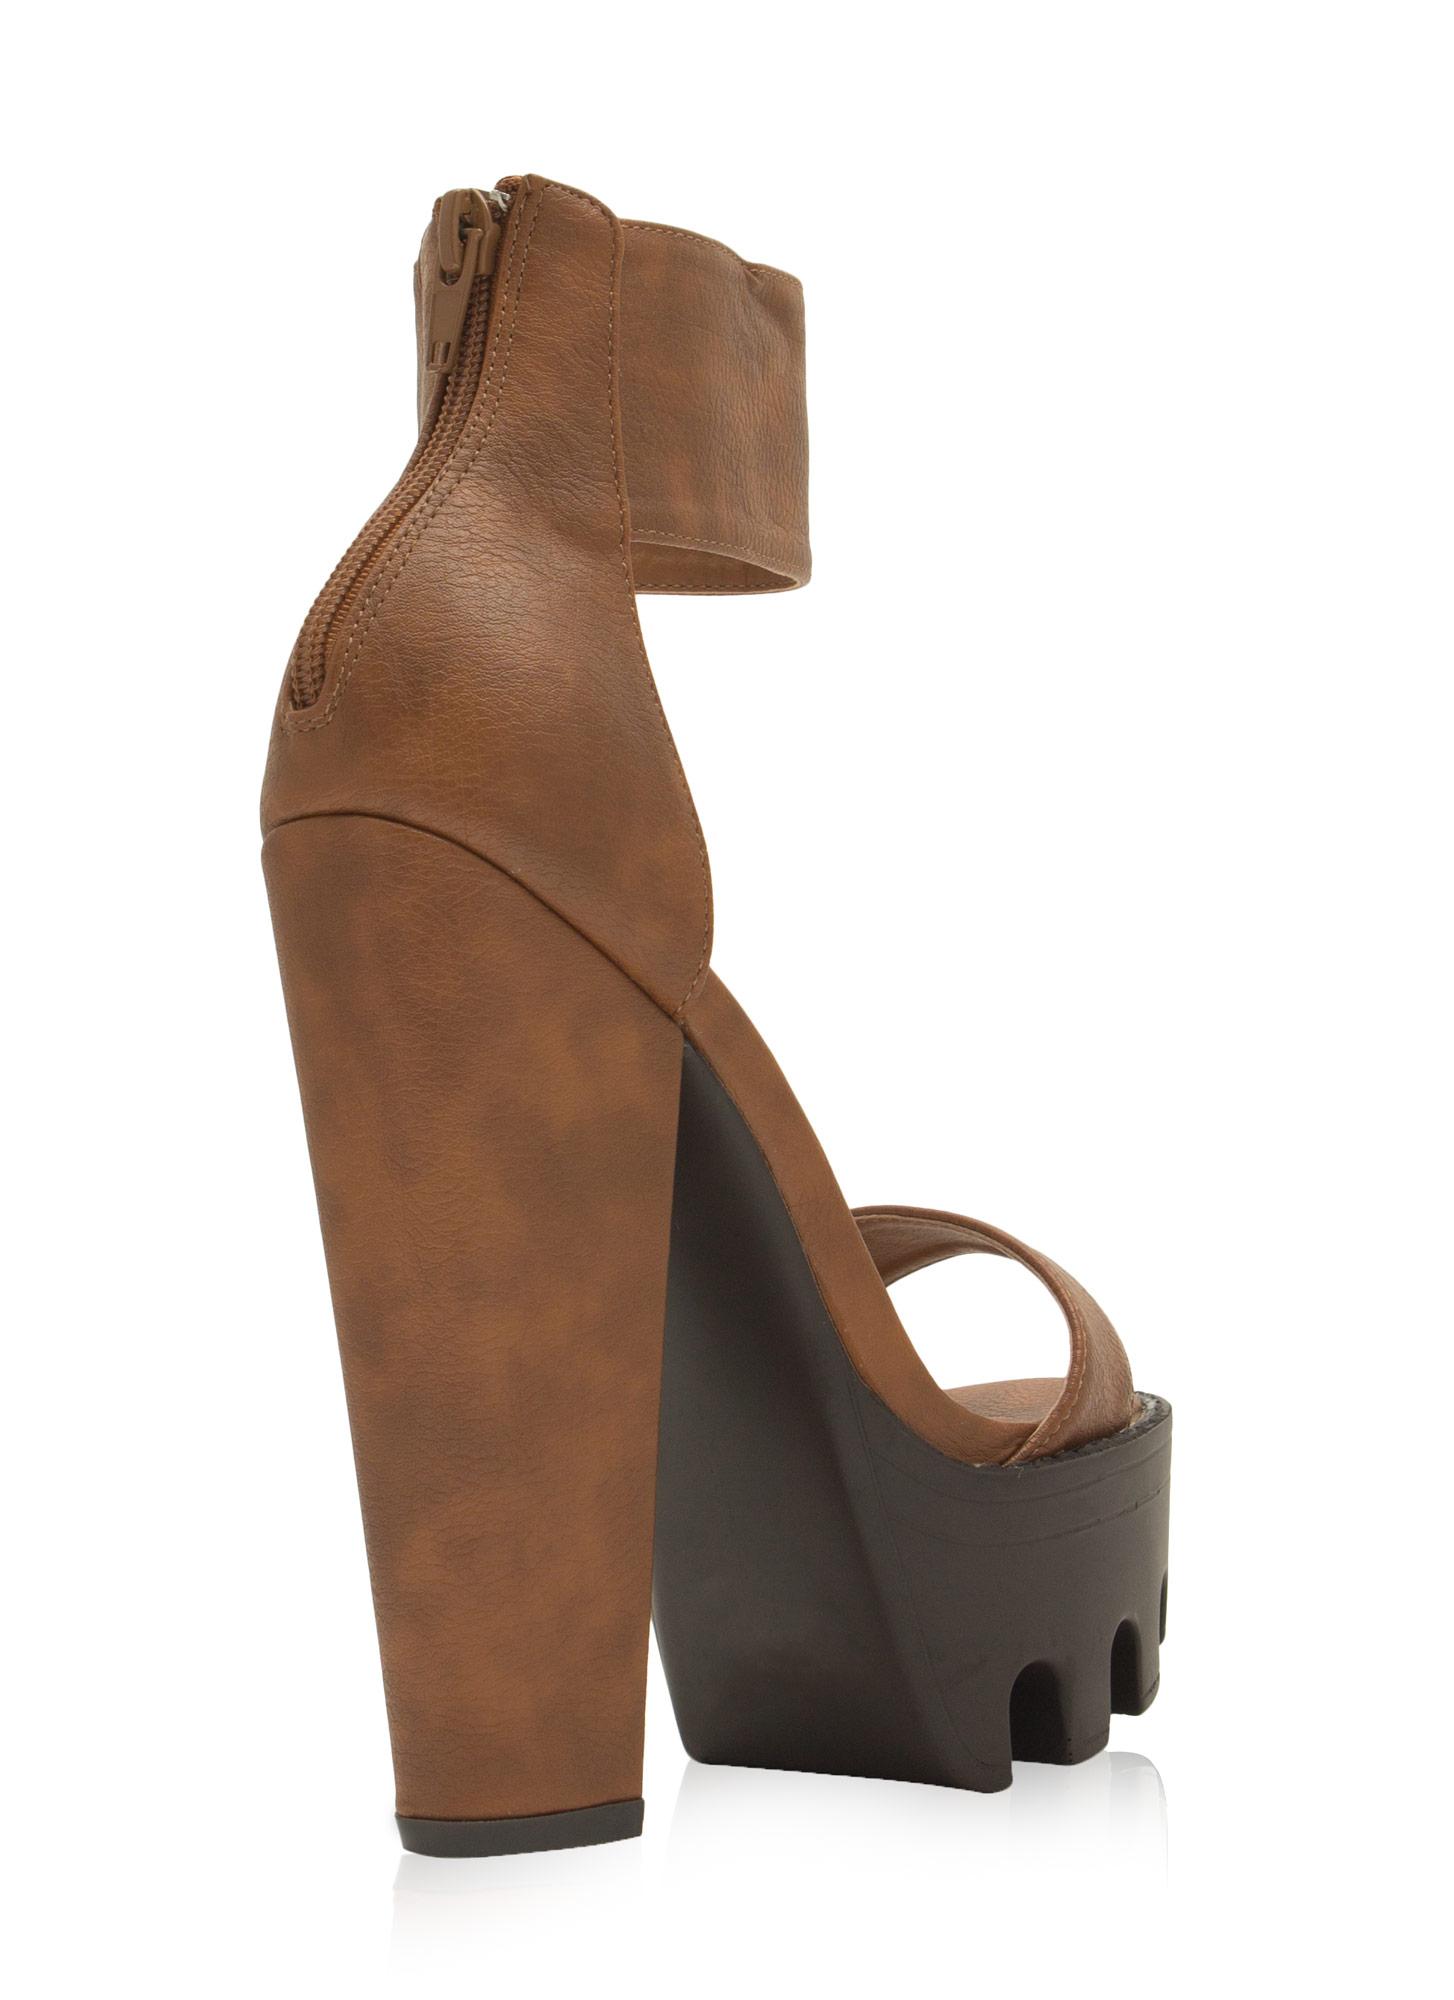 Be A Lady Chunky Ankle Cuff Heels COGNAC LEOPARD BLACK - GoJane.com